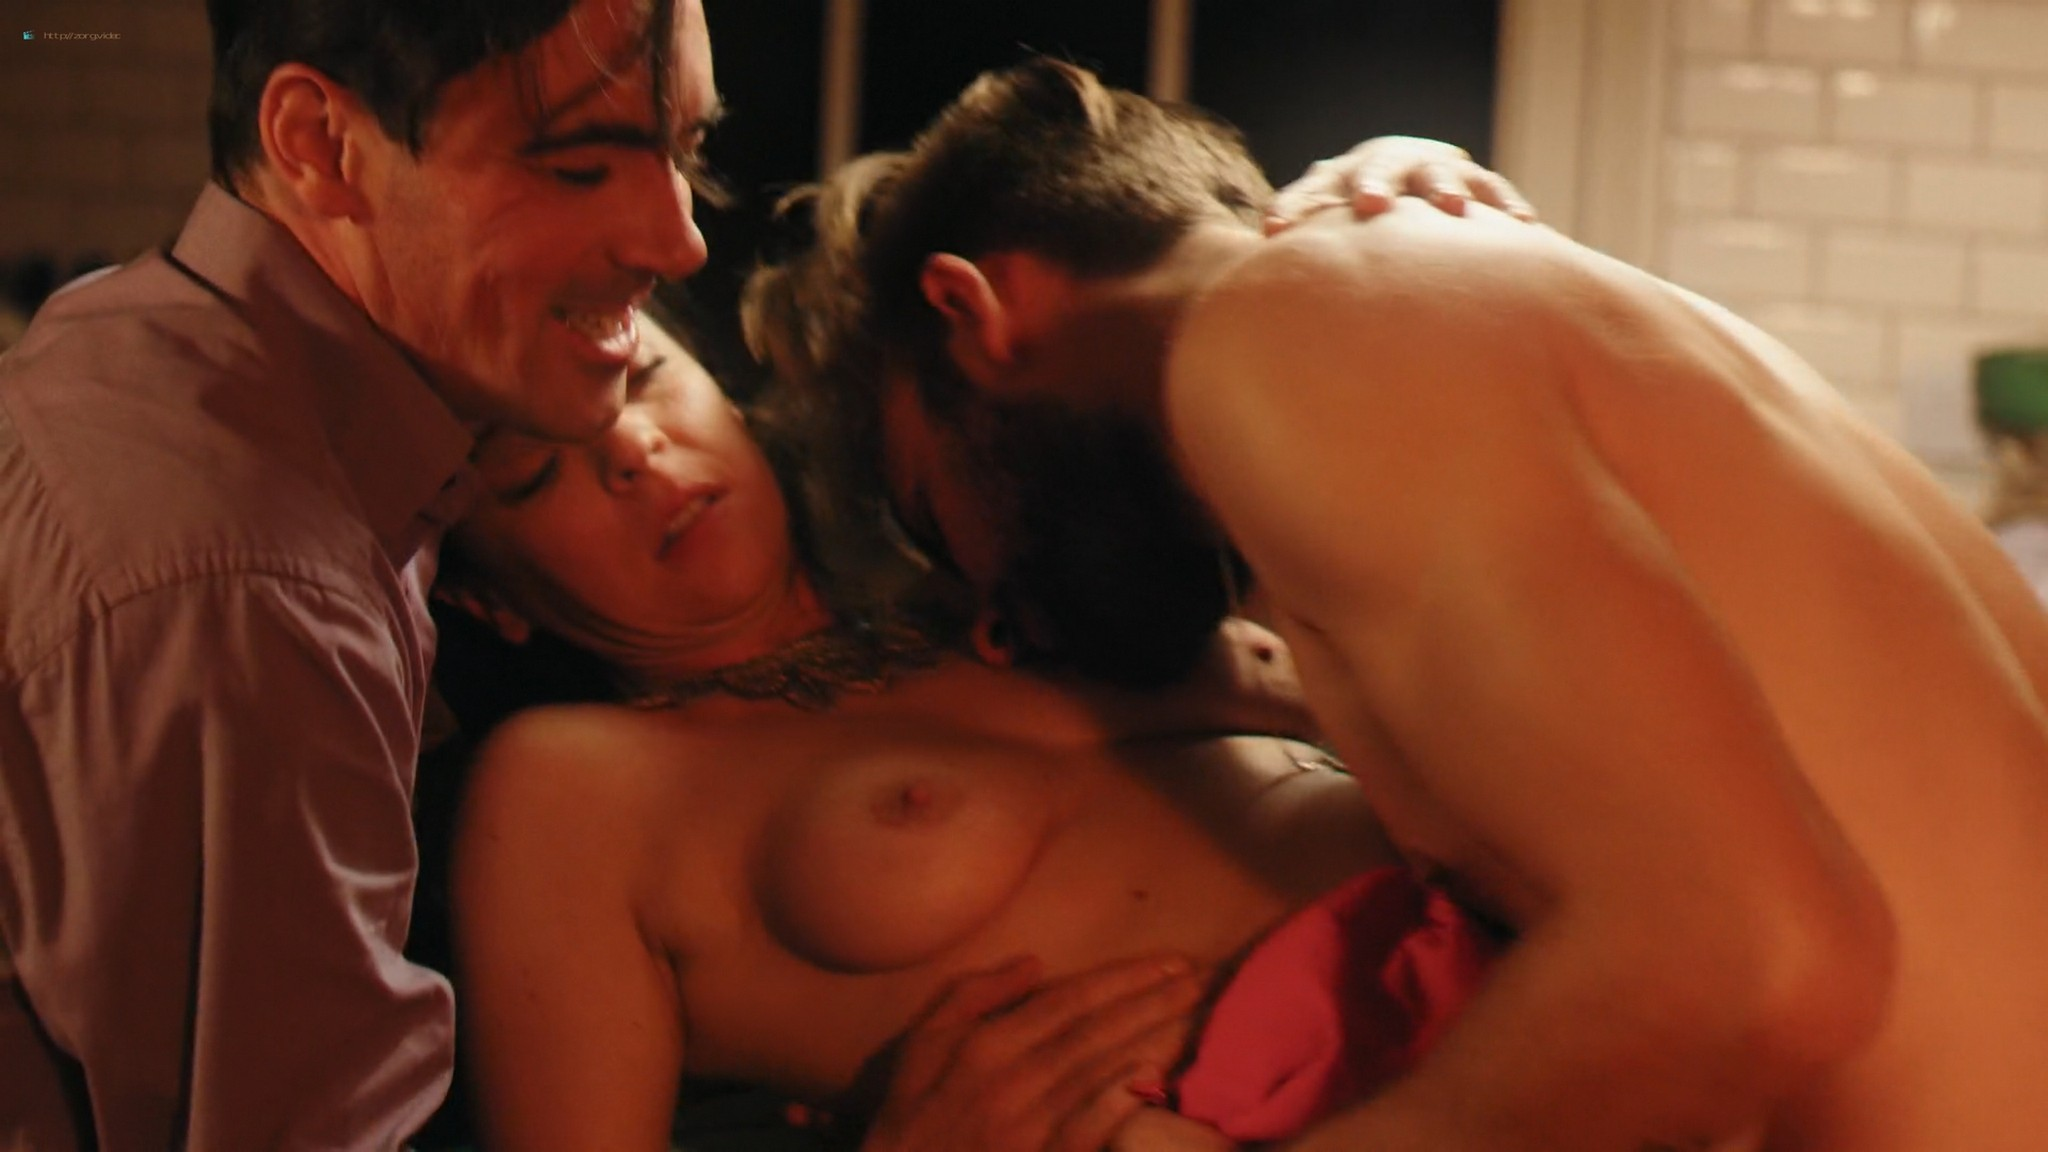 Keely Cat Wells nude Claudine-Helene Aumord full-frontal - Dirty Work (2018) HD 1080p Web (6)